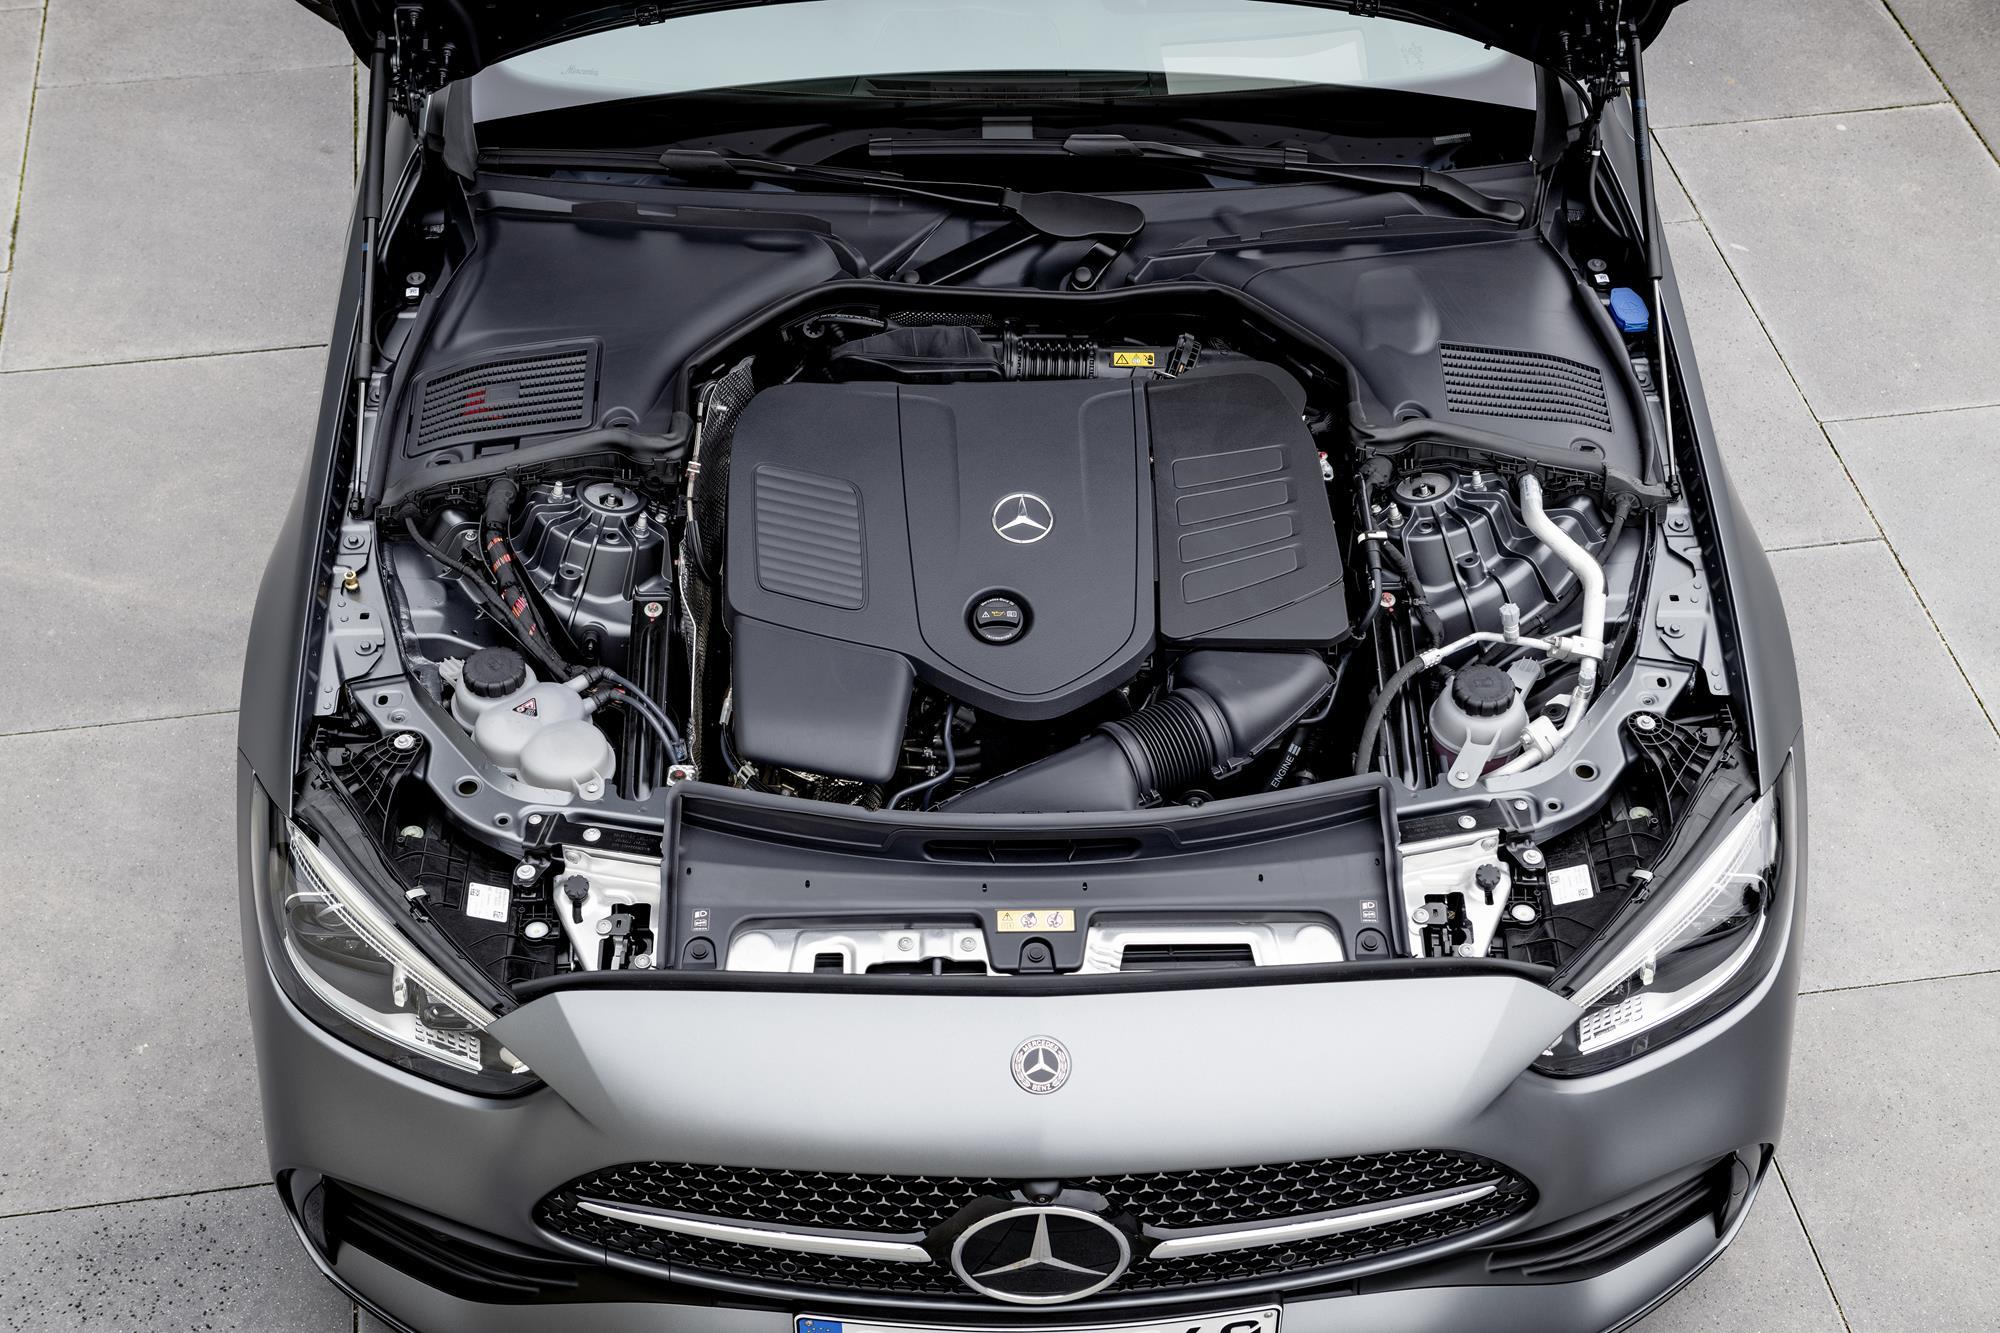 Mercedes-Benz-Classe-C-2022-11.jpg